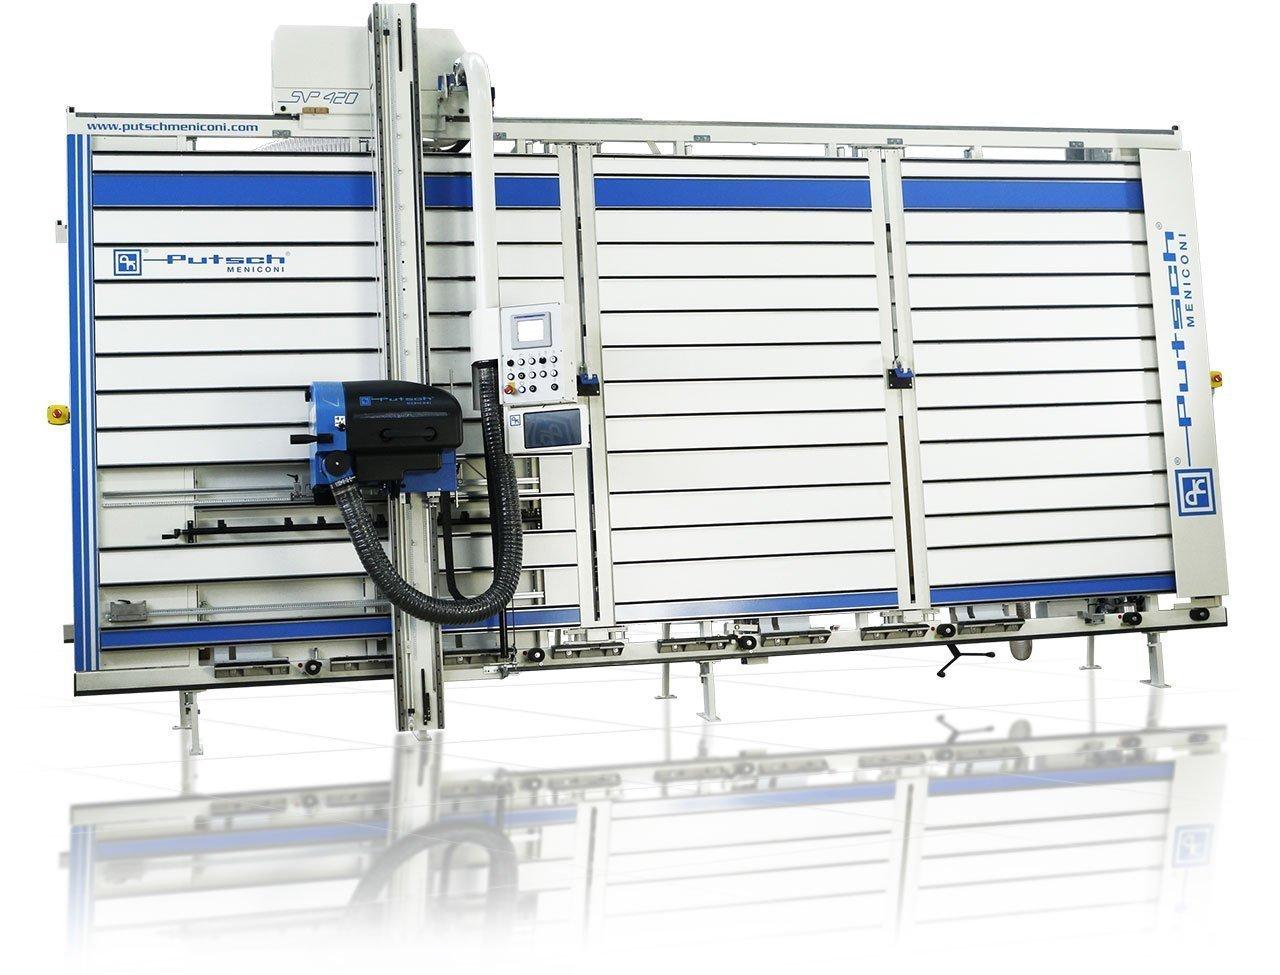 Vertical squaring machine SVP 420 CS TOUCH Putsch Meniconi